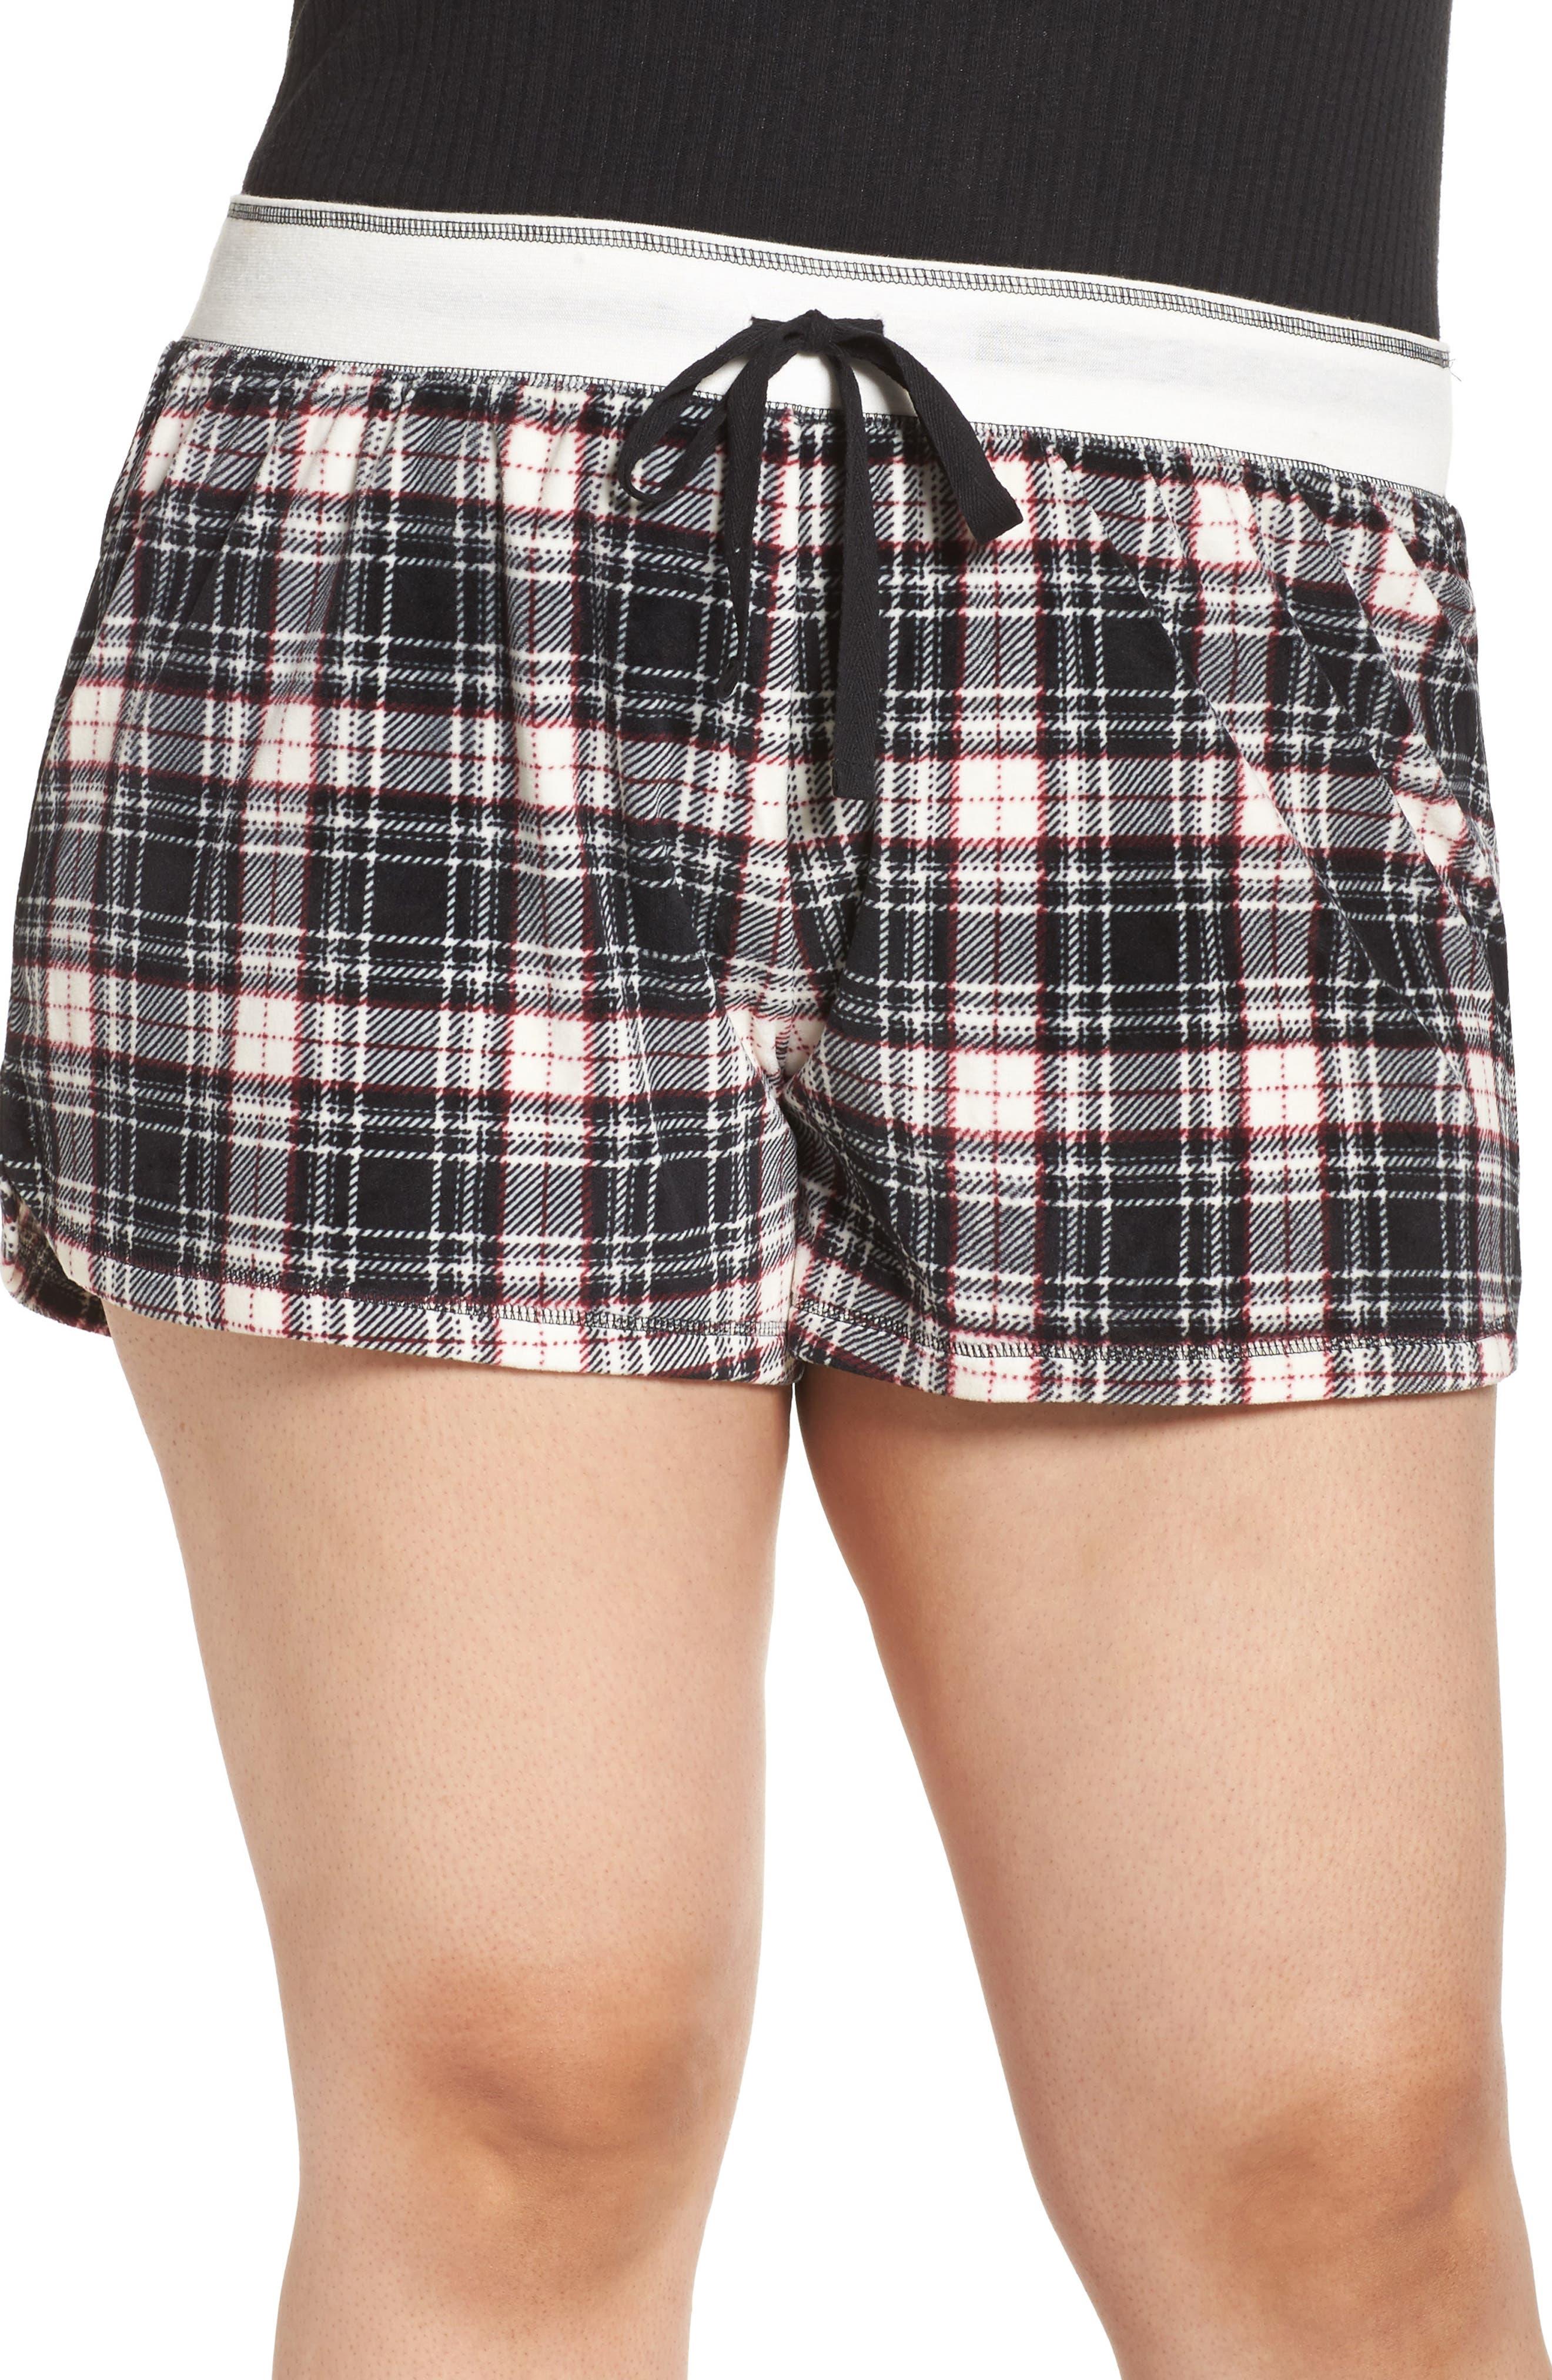 Alternate Image 1 Selected - PJ Salvage Velour Shorts (Plus Size)